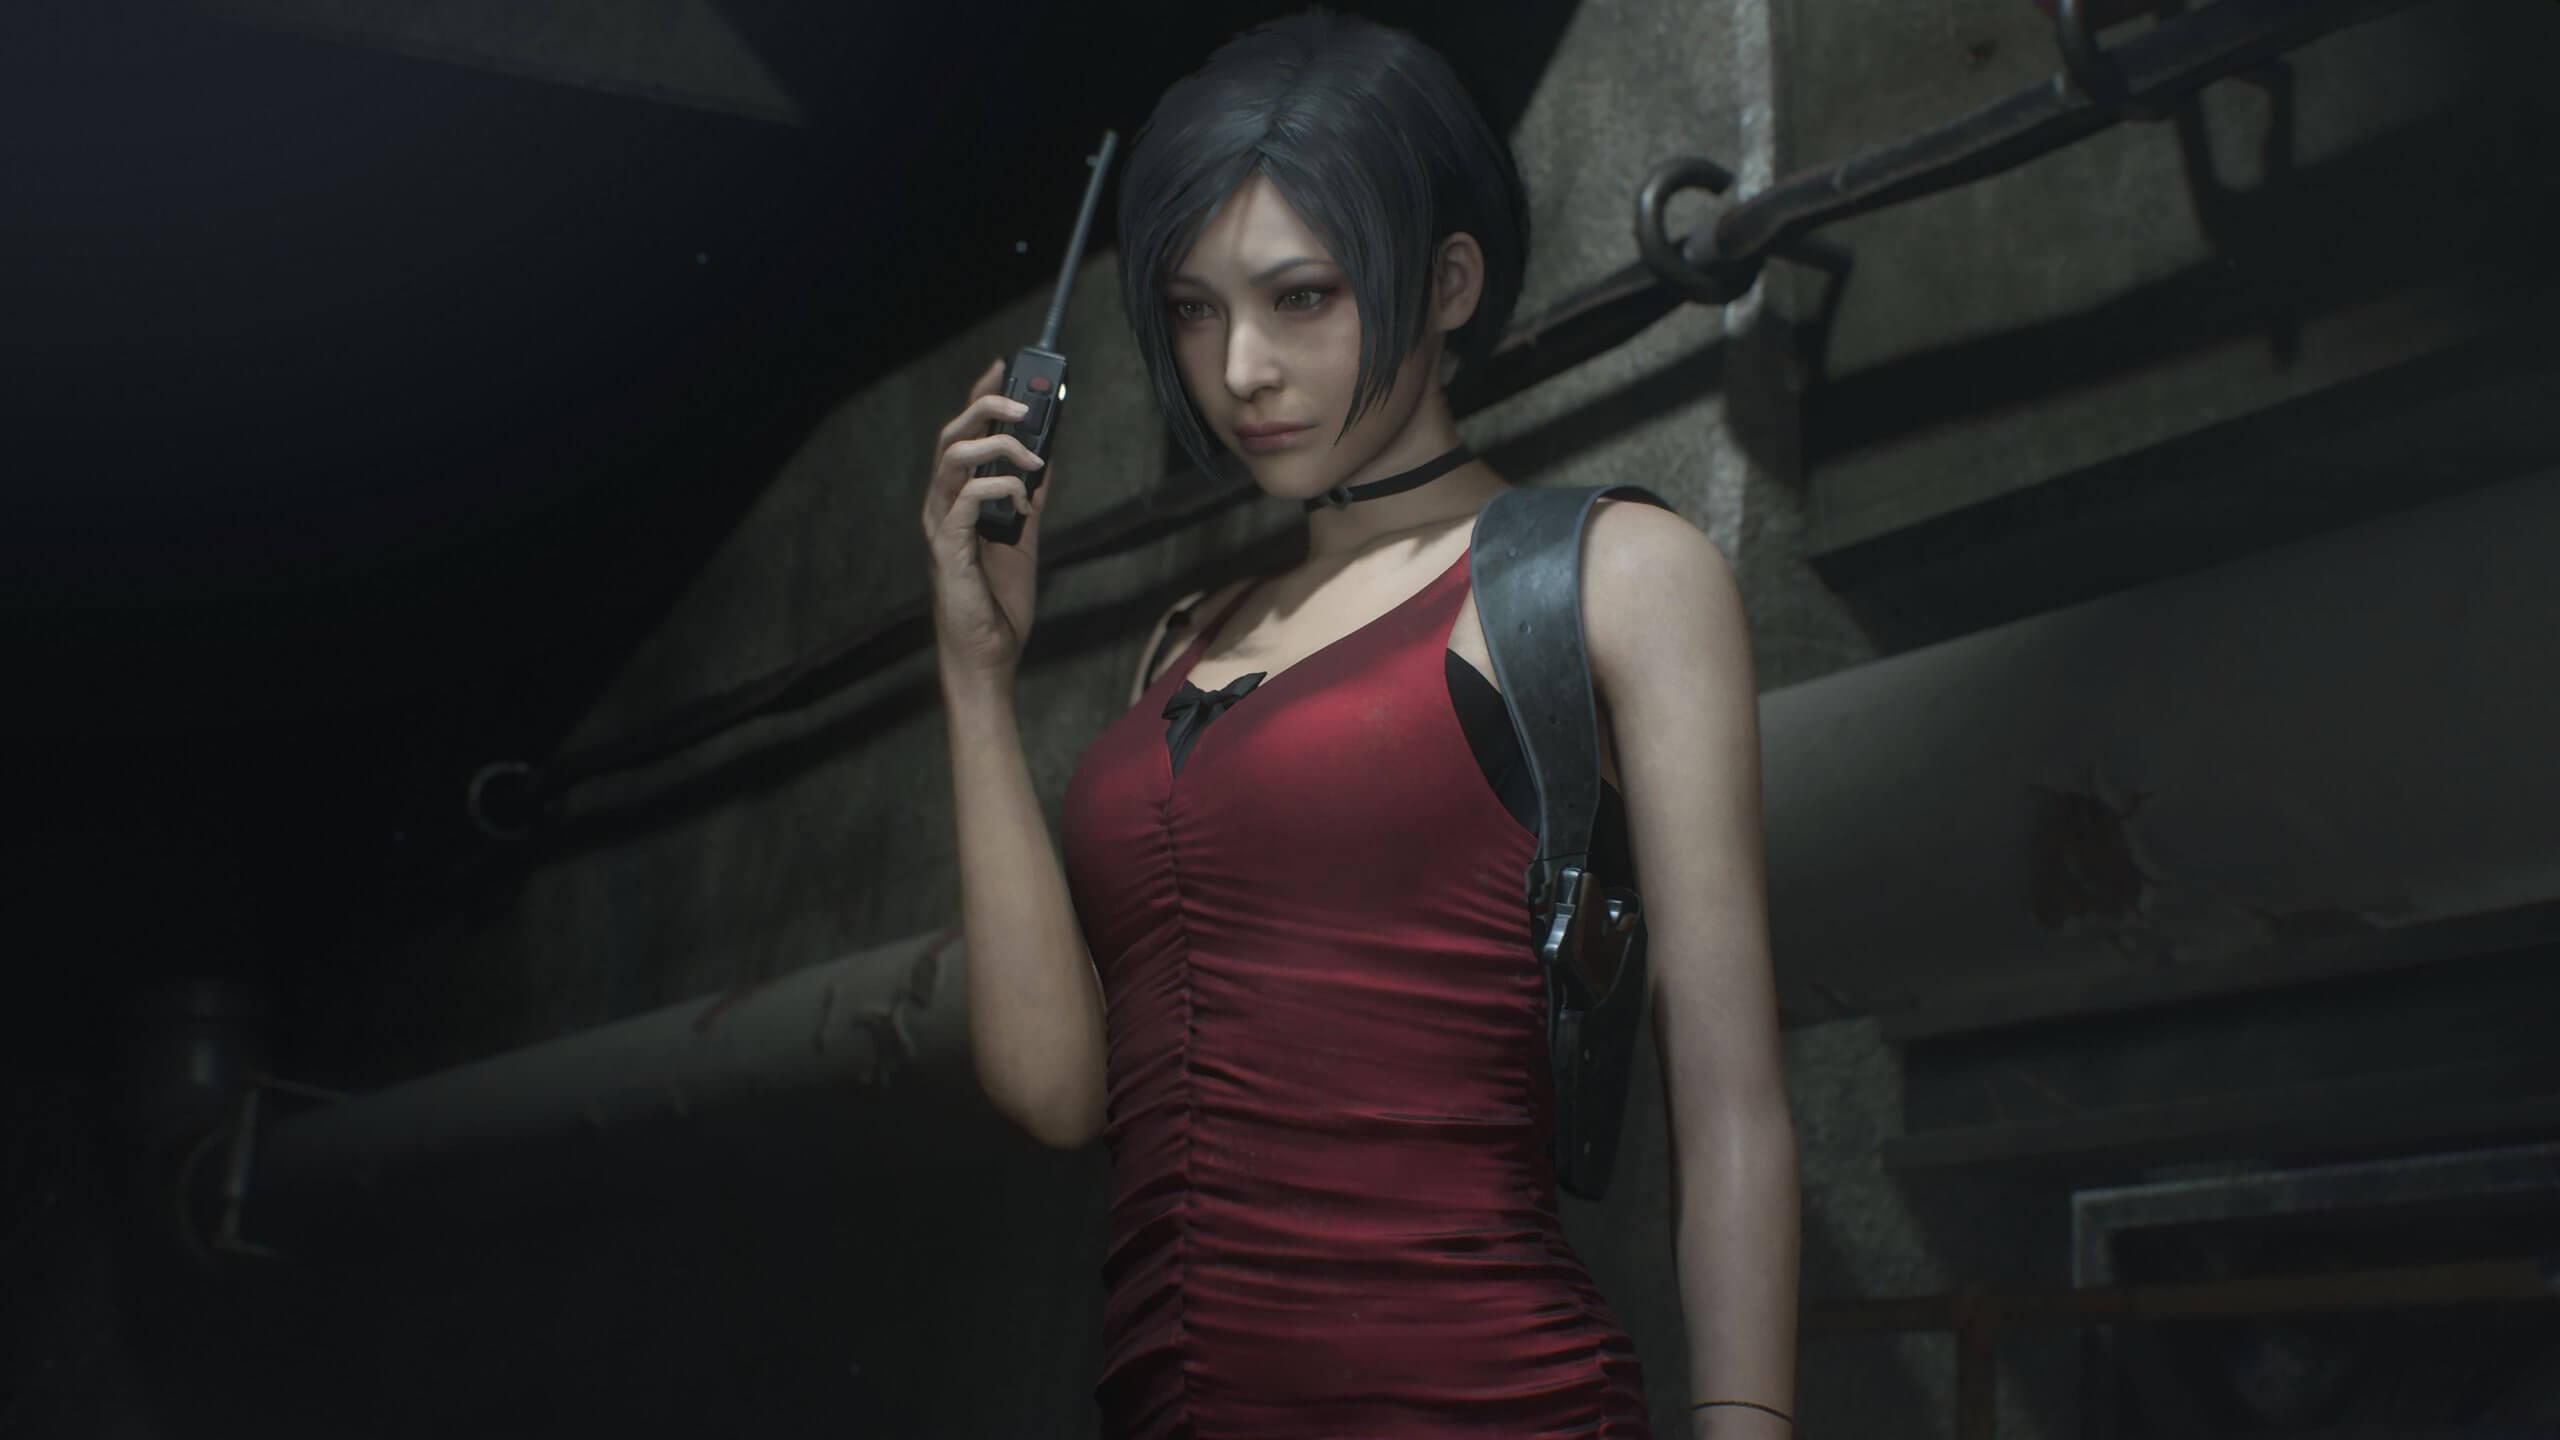 Ada Wong sí iba a salir en Resident Evil Village inicialmente, pero fue descartada